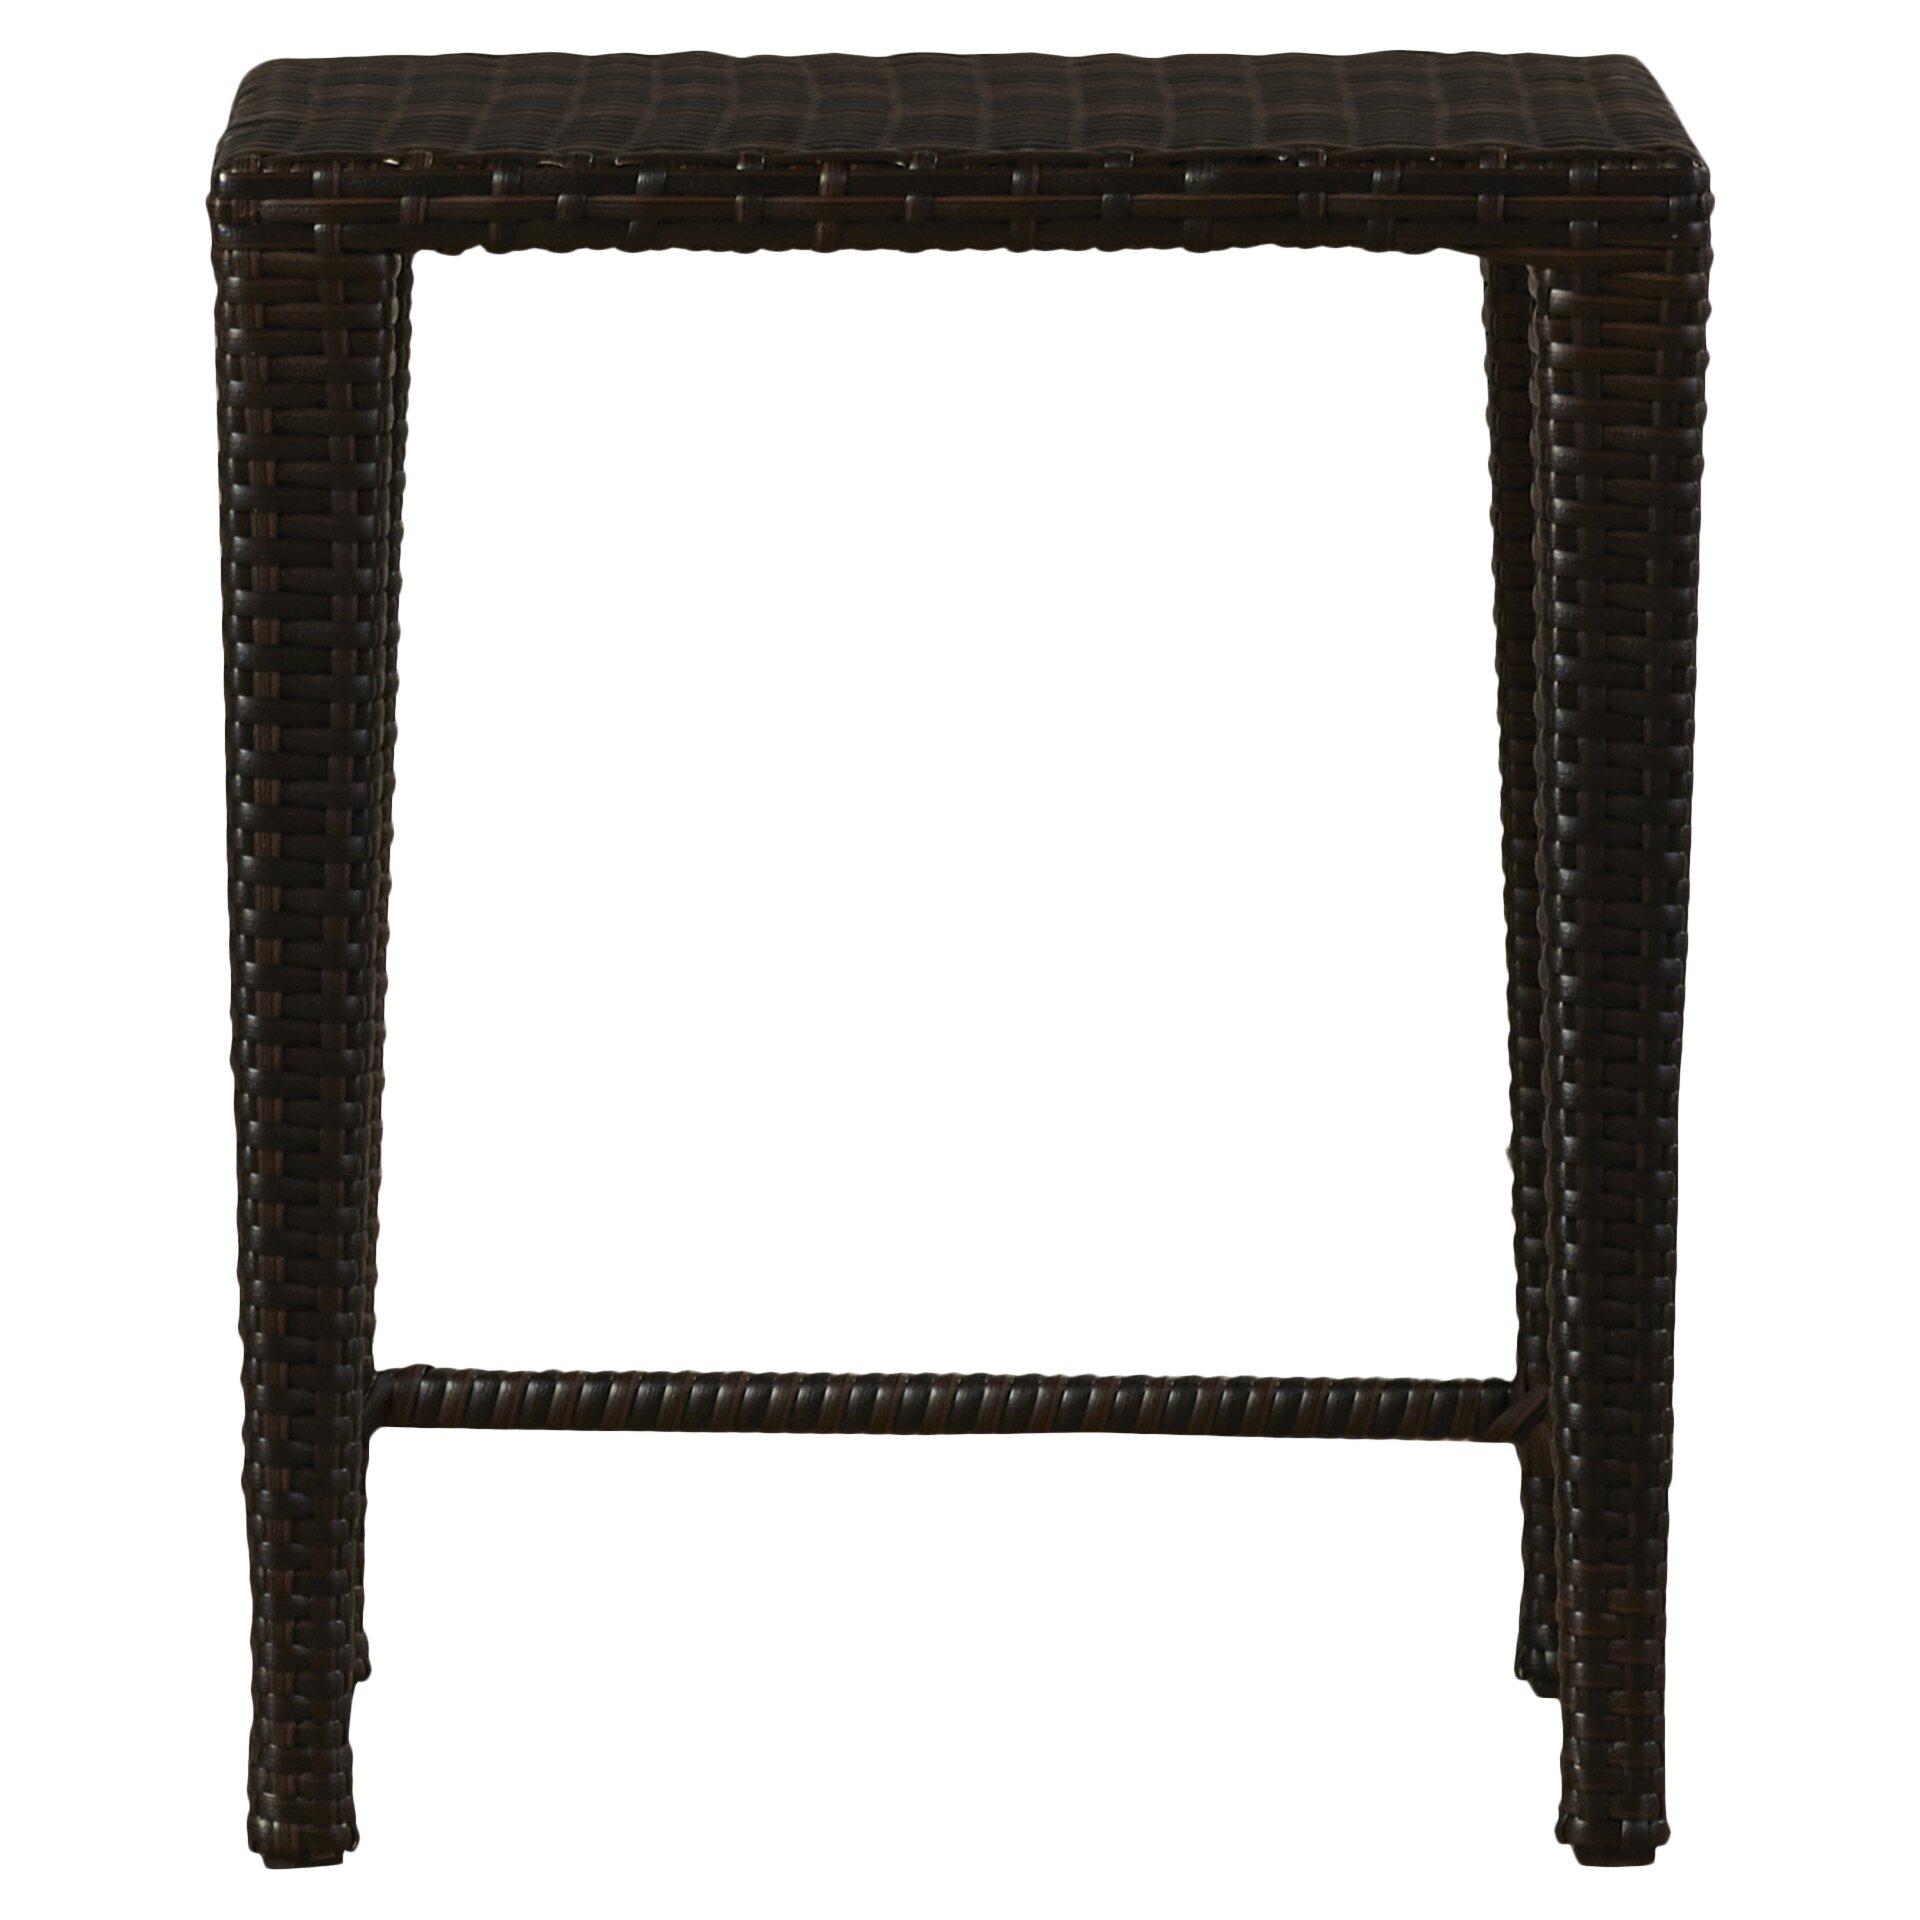 brayden studio waylon 5 piece adjustable chaise lounge. Black Bedroom Furniture Sets. Home Design Ideas